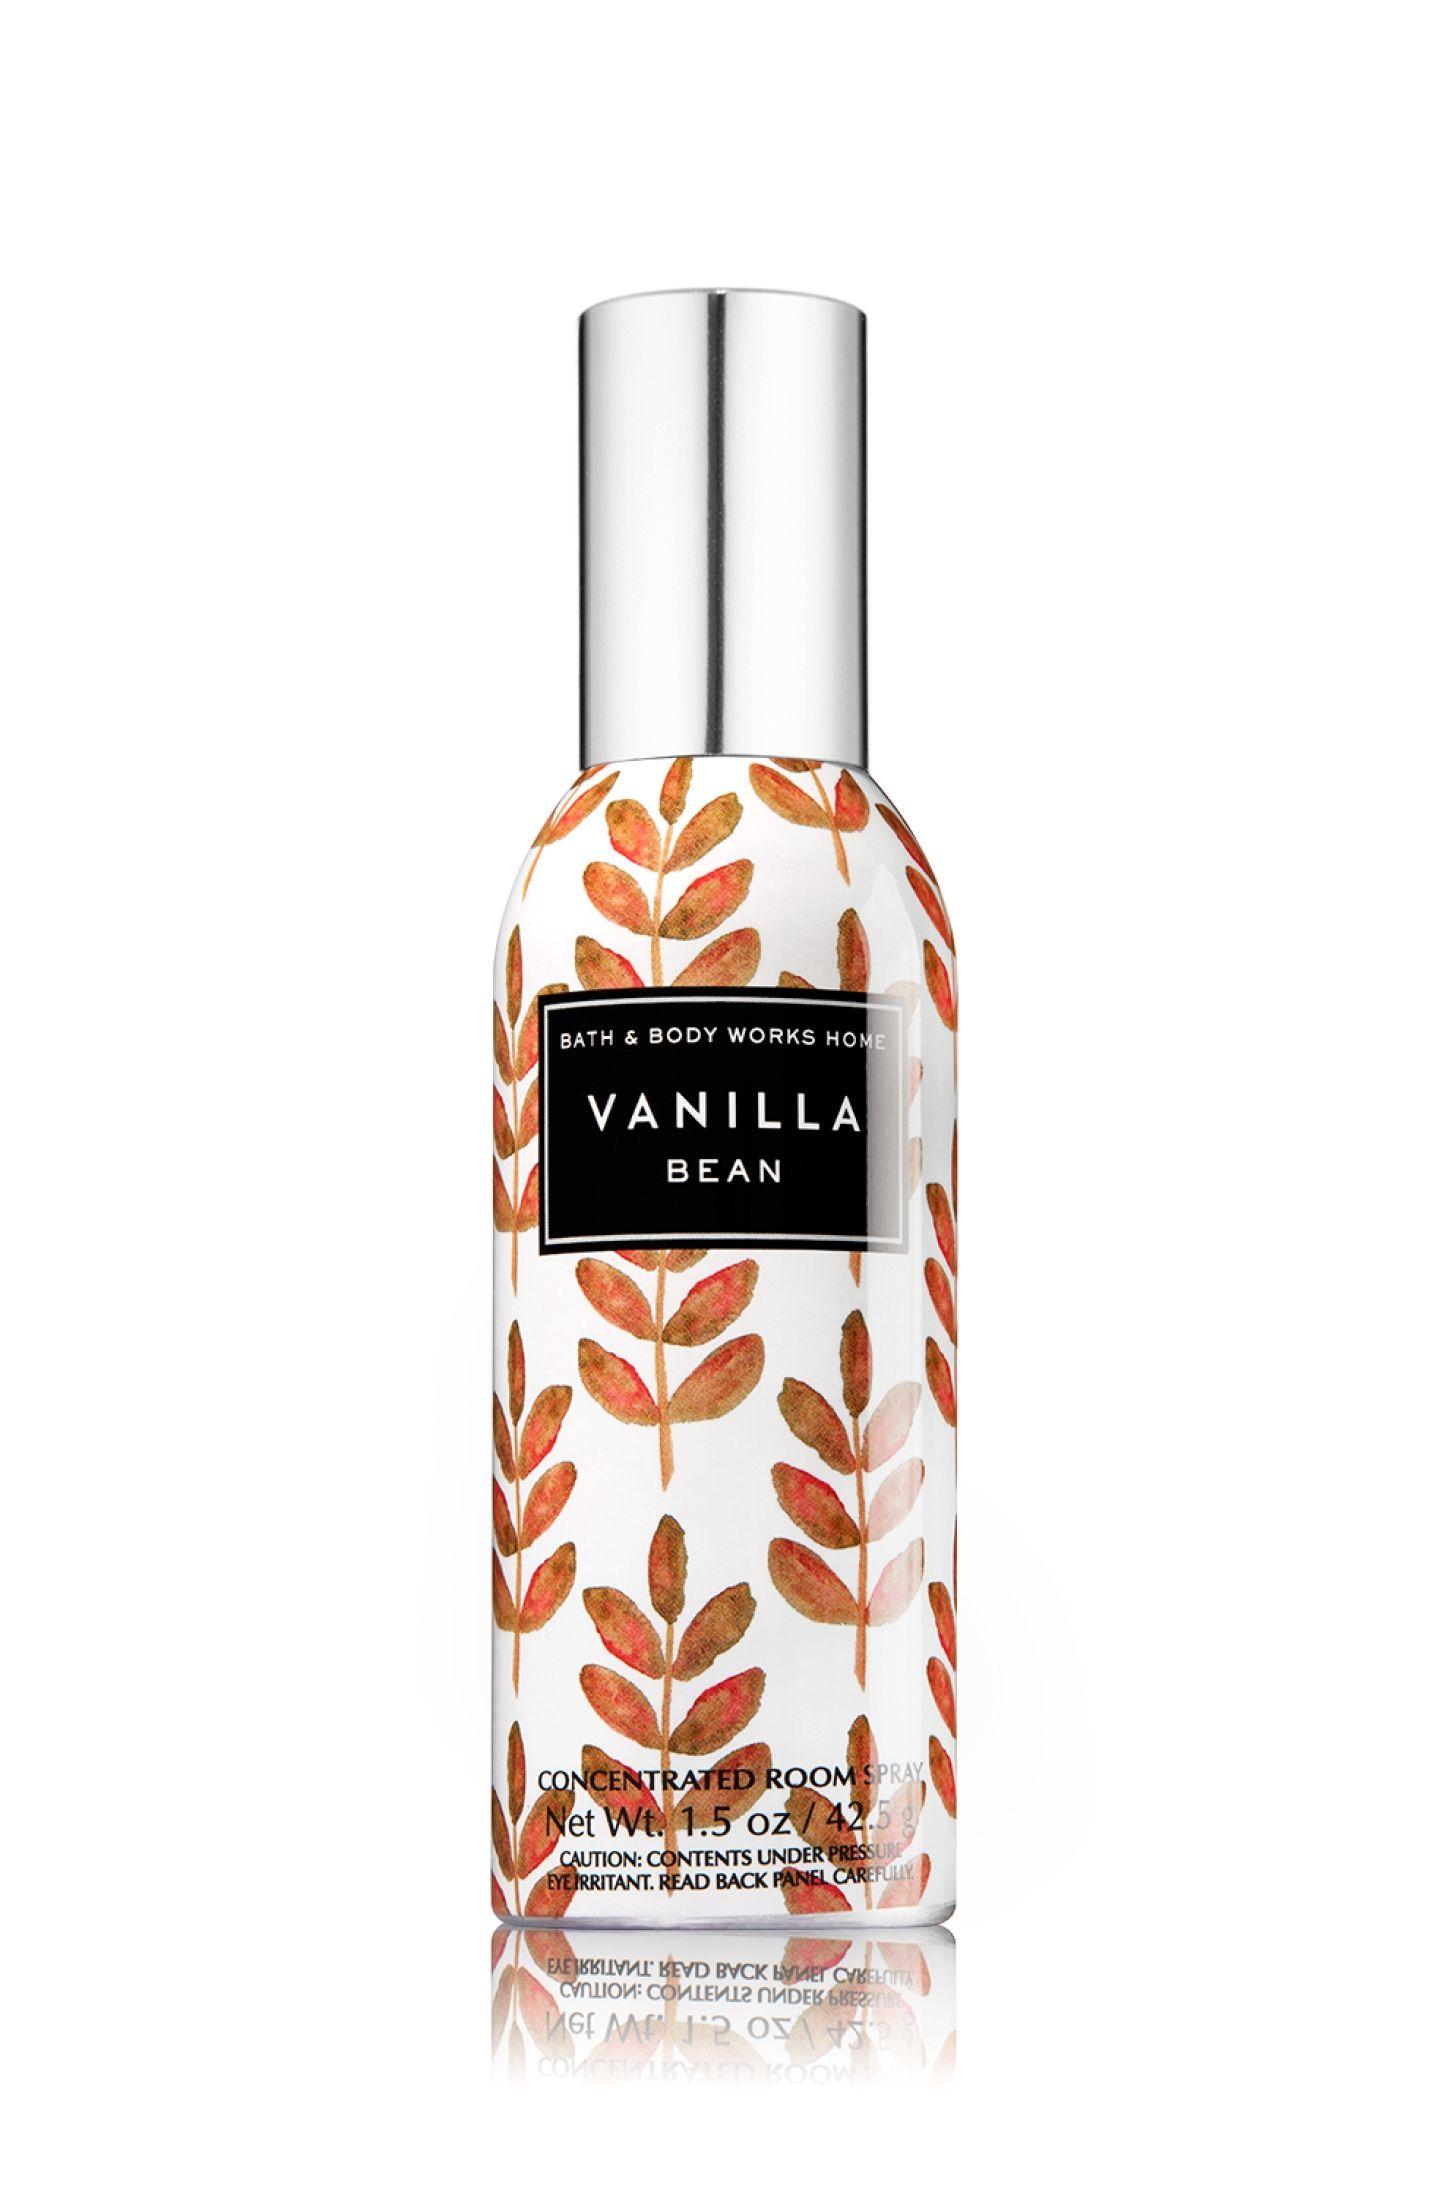 Vanilla Bean 1 5 Oz Room Perfume Home Fragrance 1037181 Bath